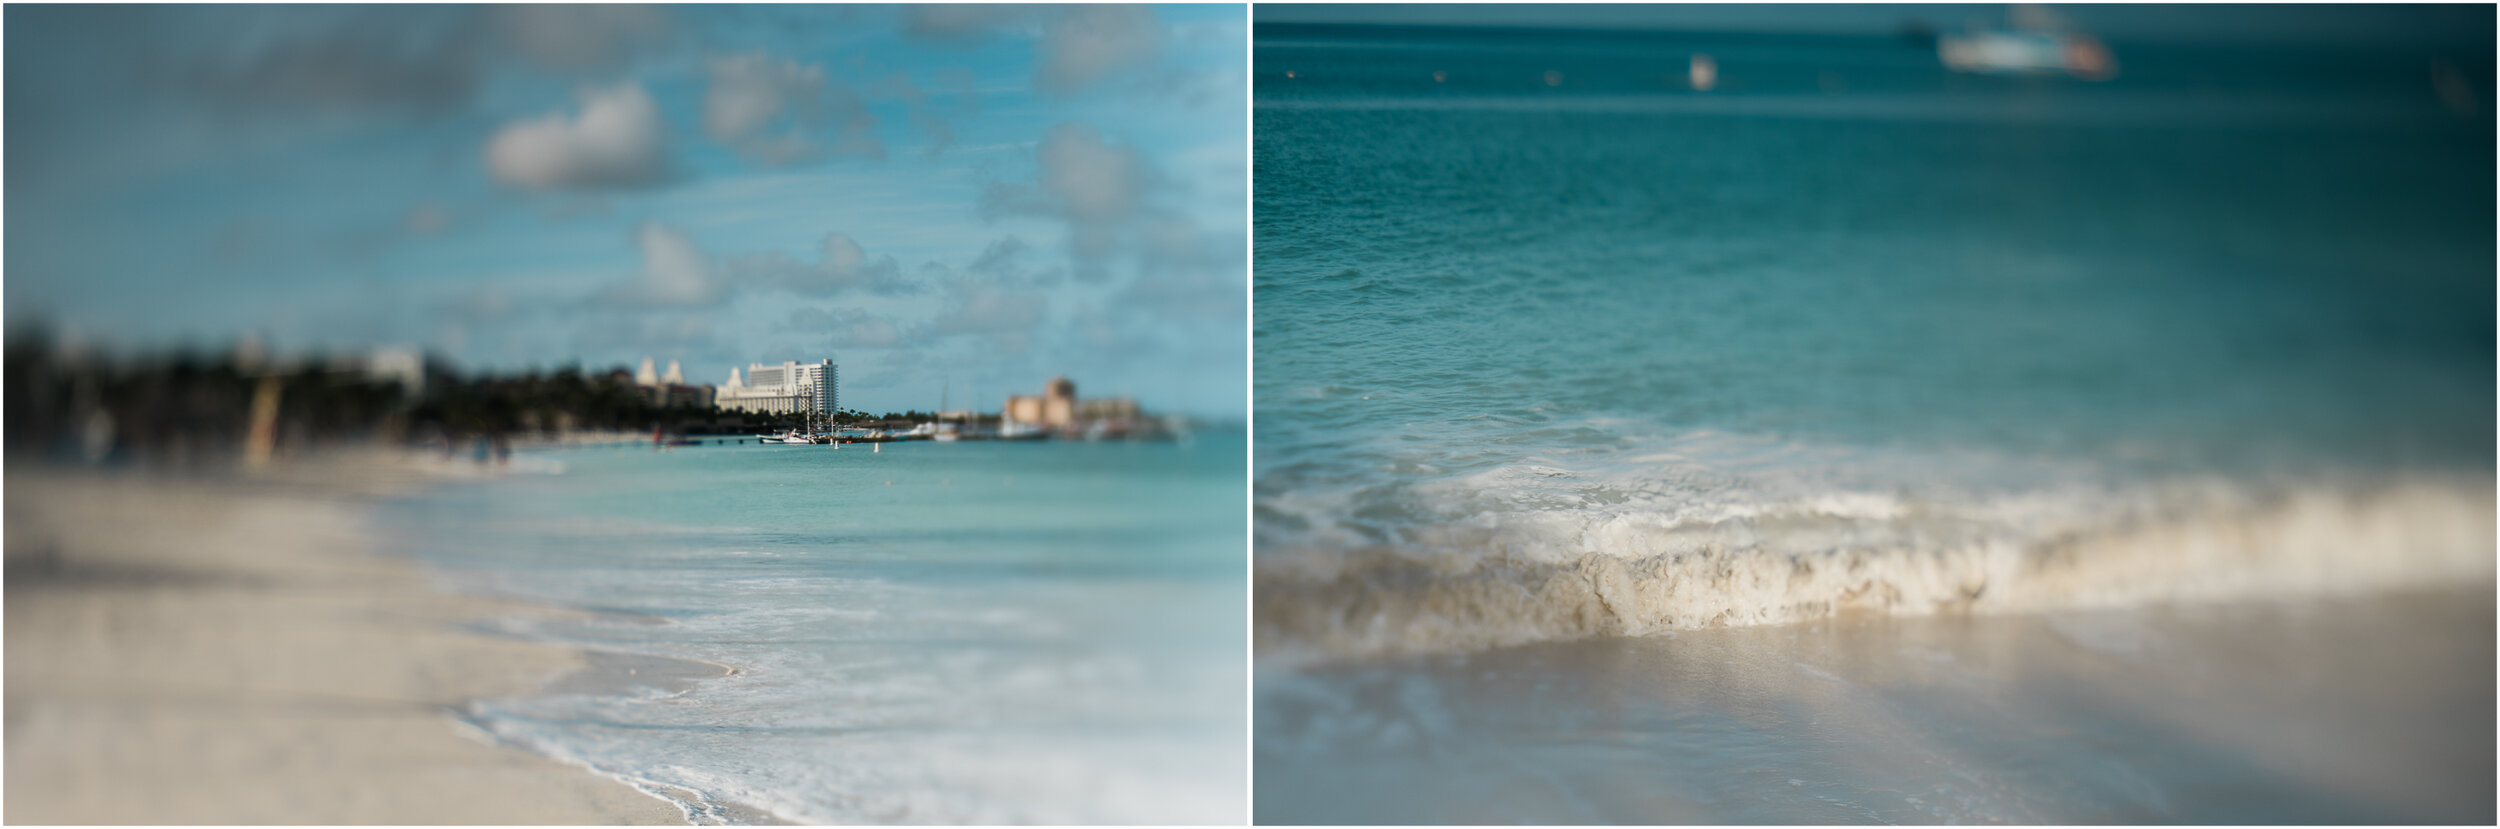 Aruba beach, lensbaby edge 50.jpg